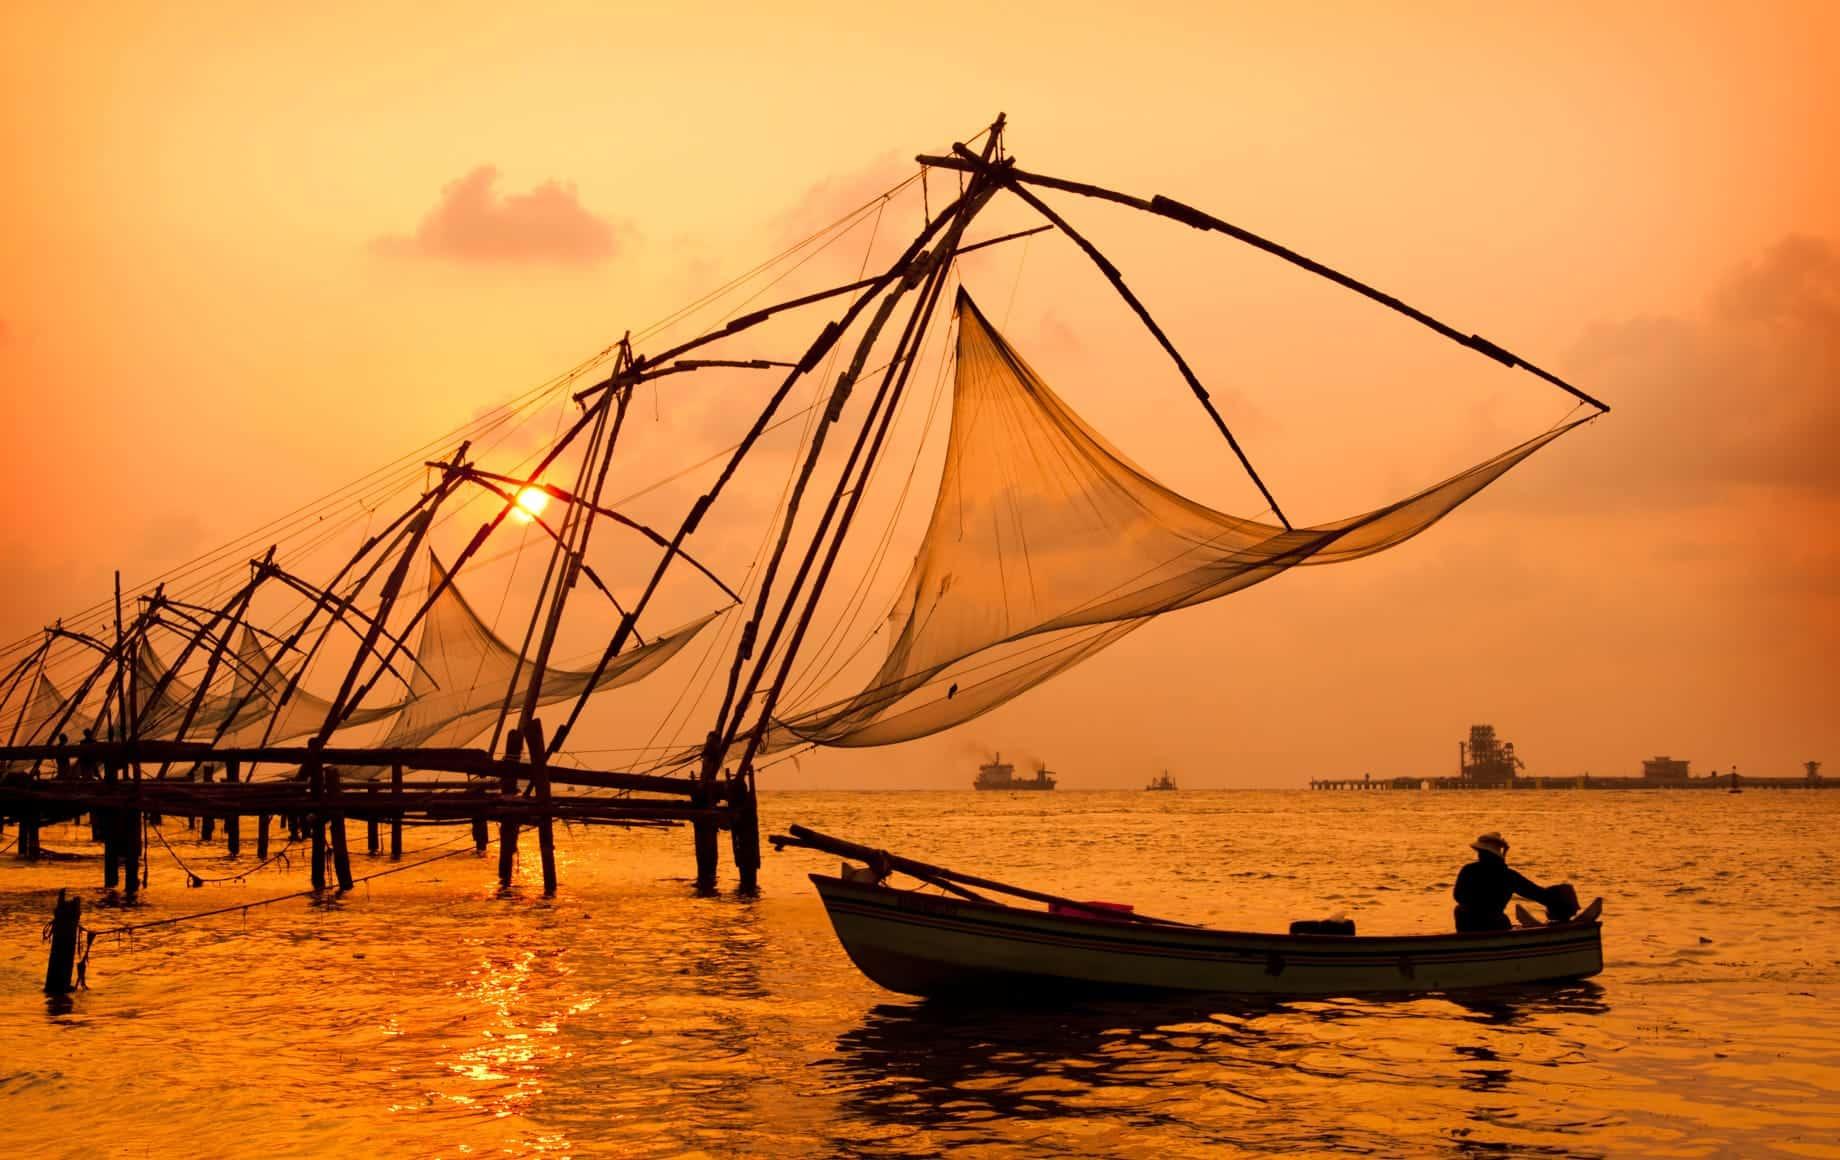 Fisherman Sunset In Kerala-india